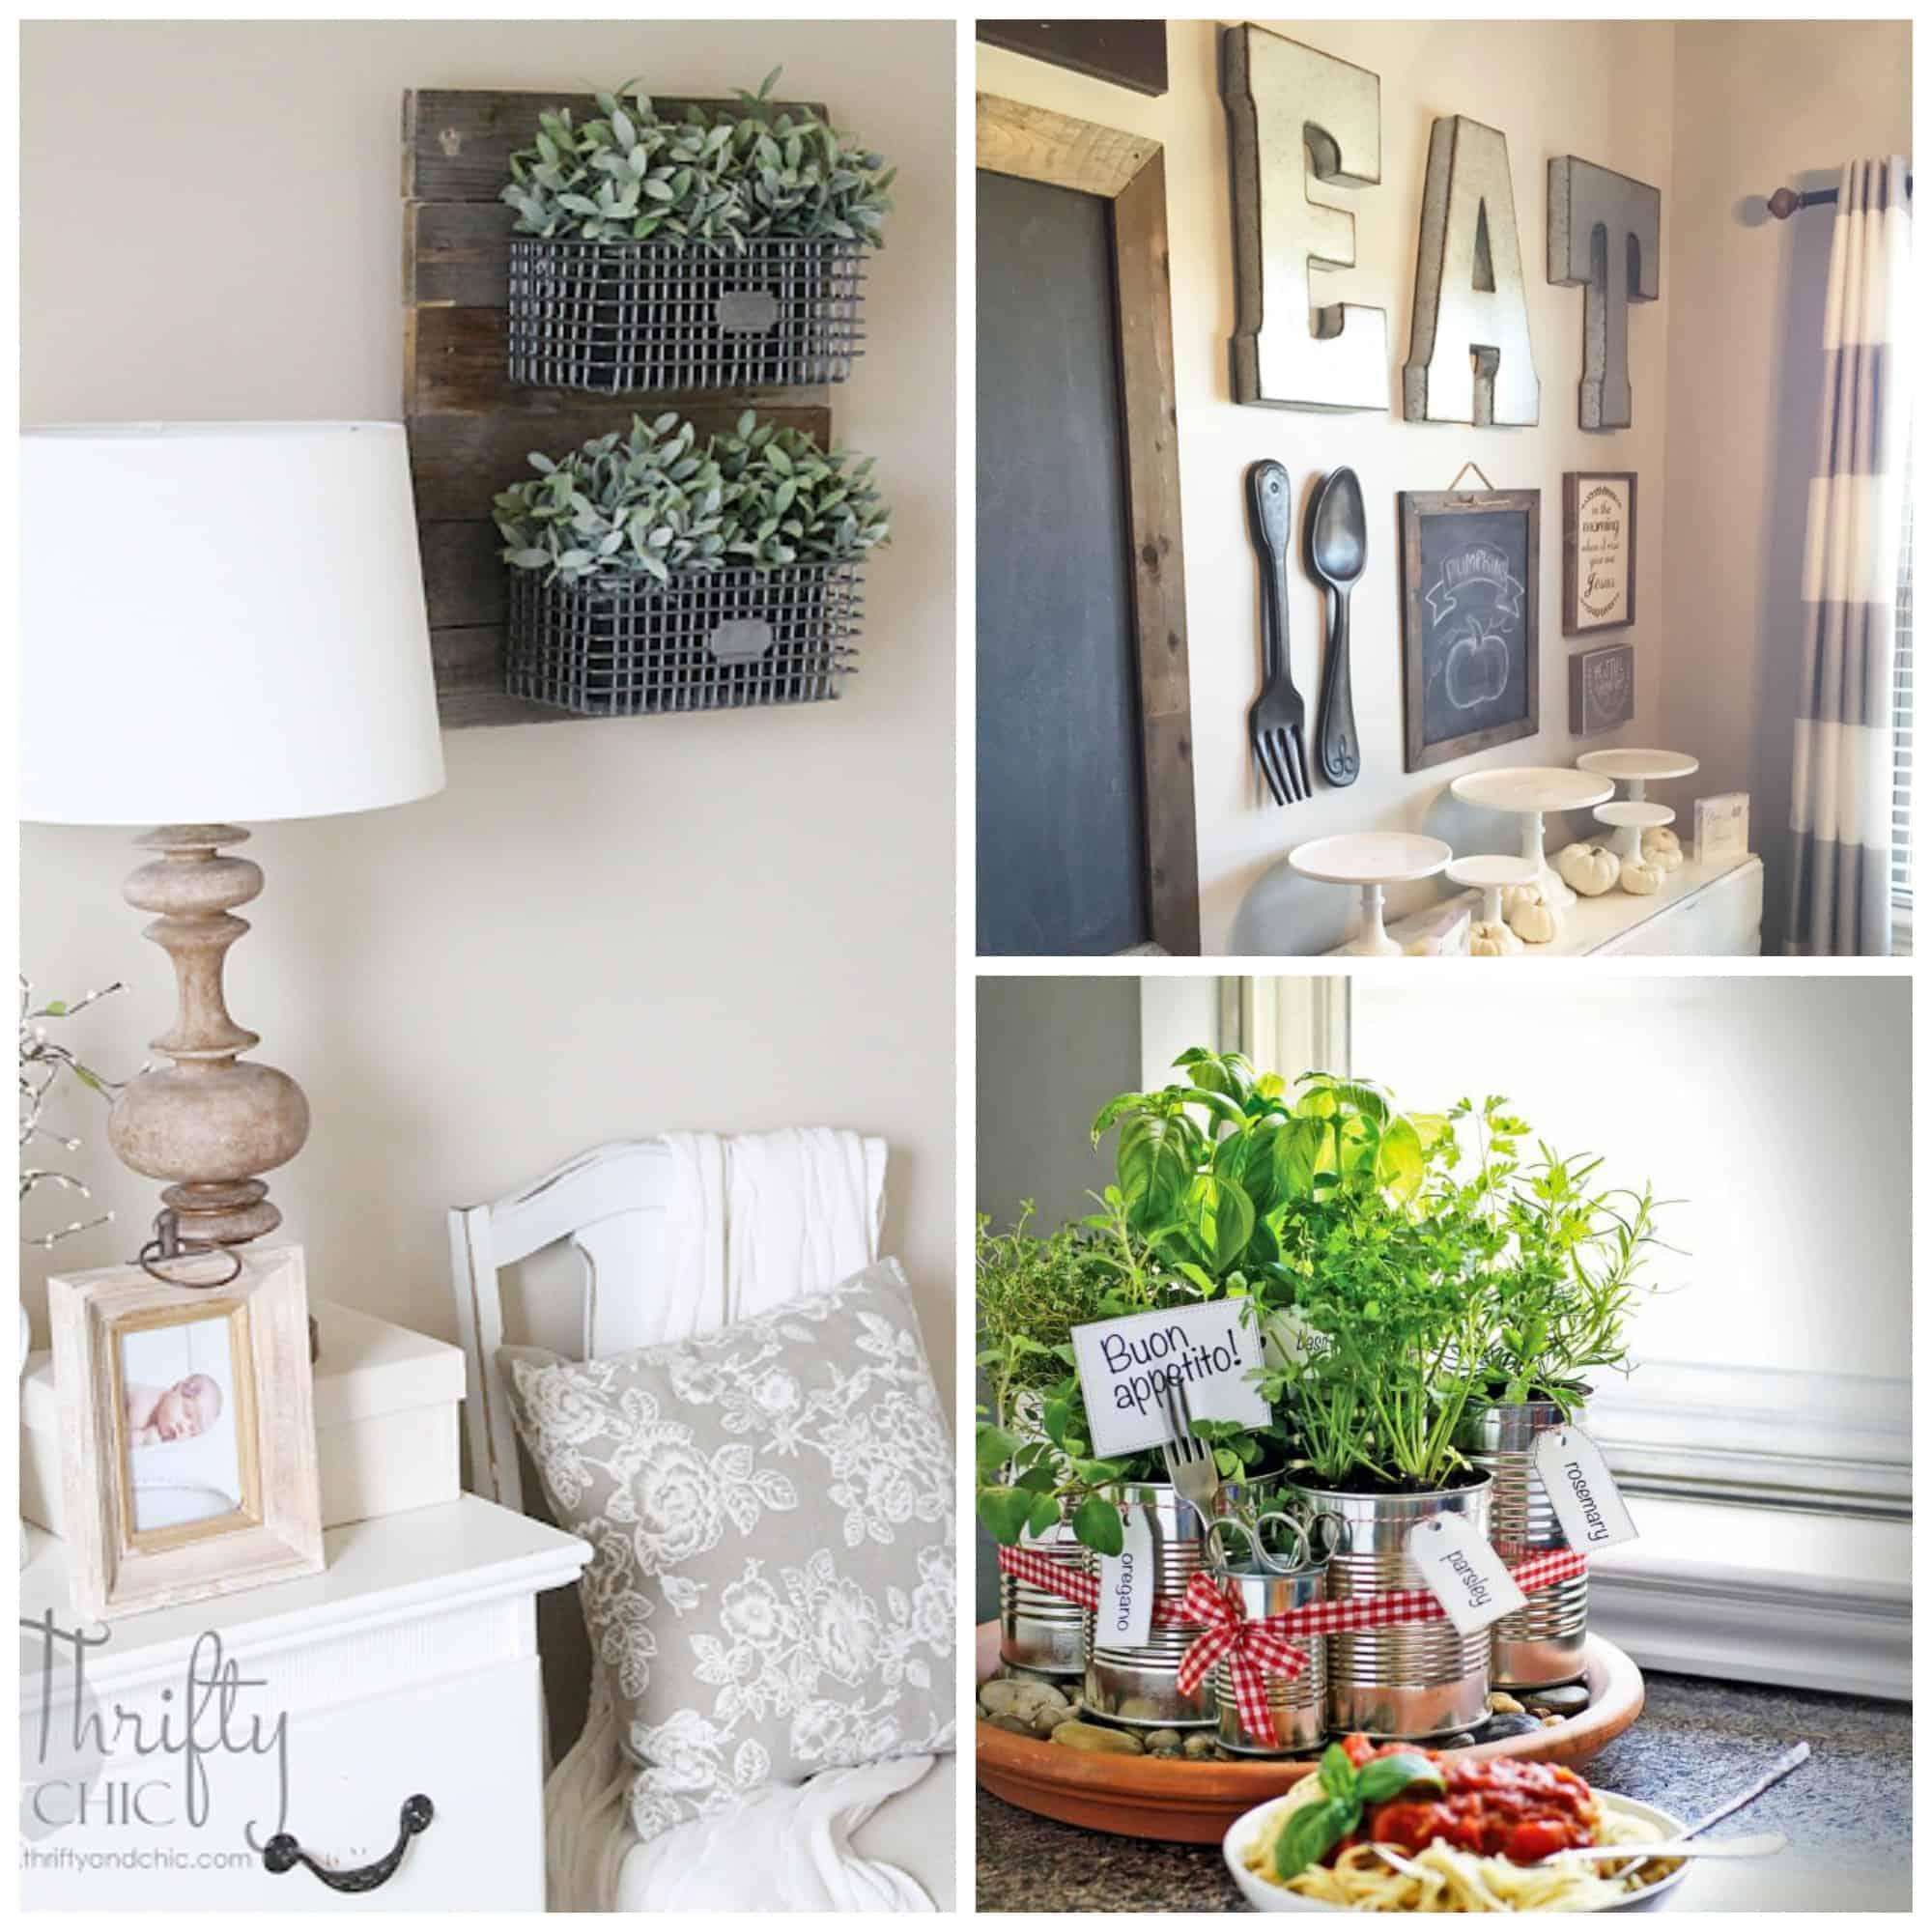 Home Design Ideas Budget: 12 Farmhouse Decor Ideas Anyone Can Do On A Budget